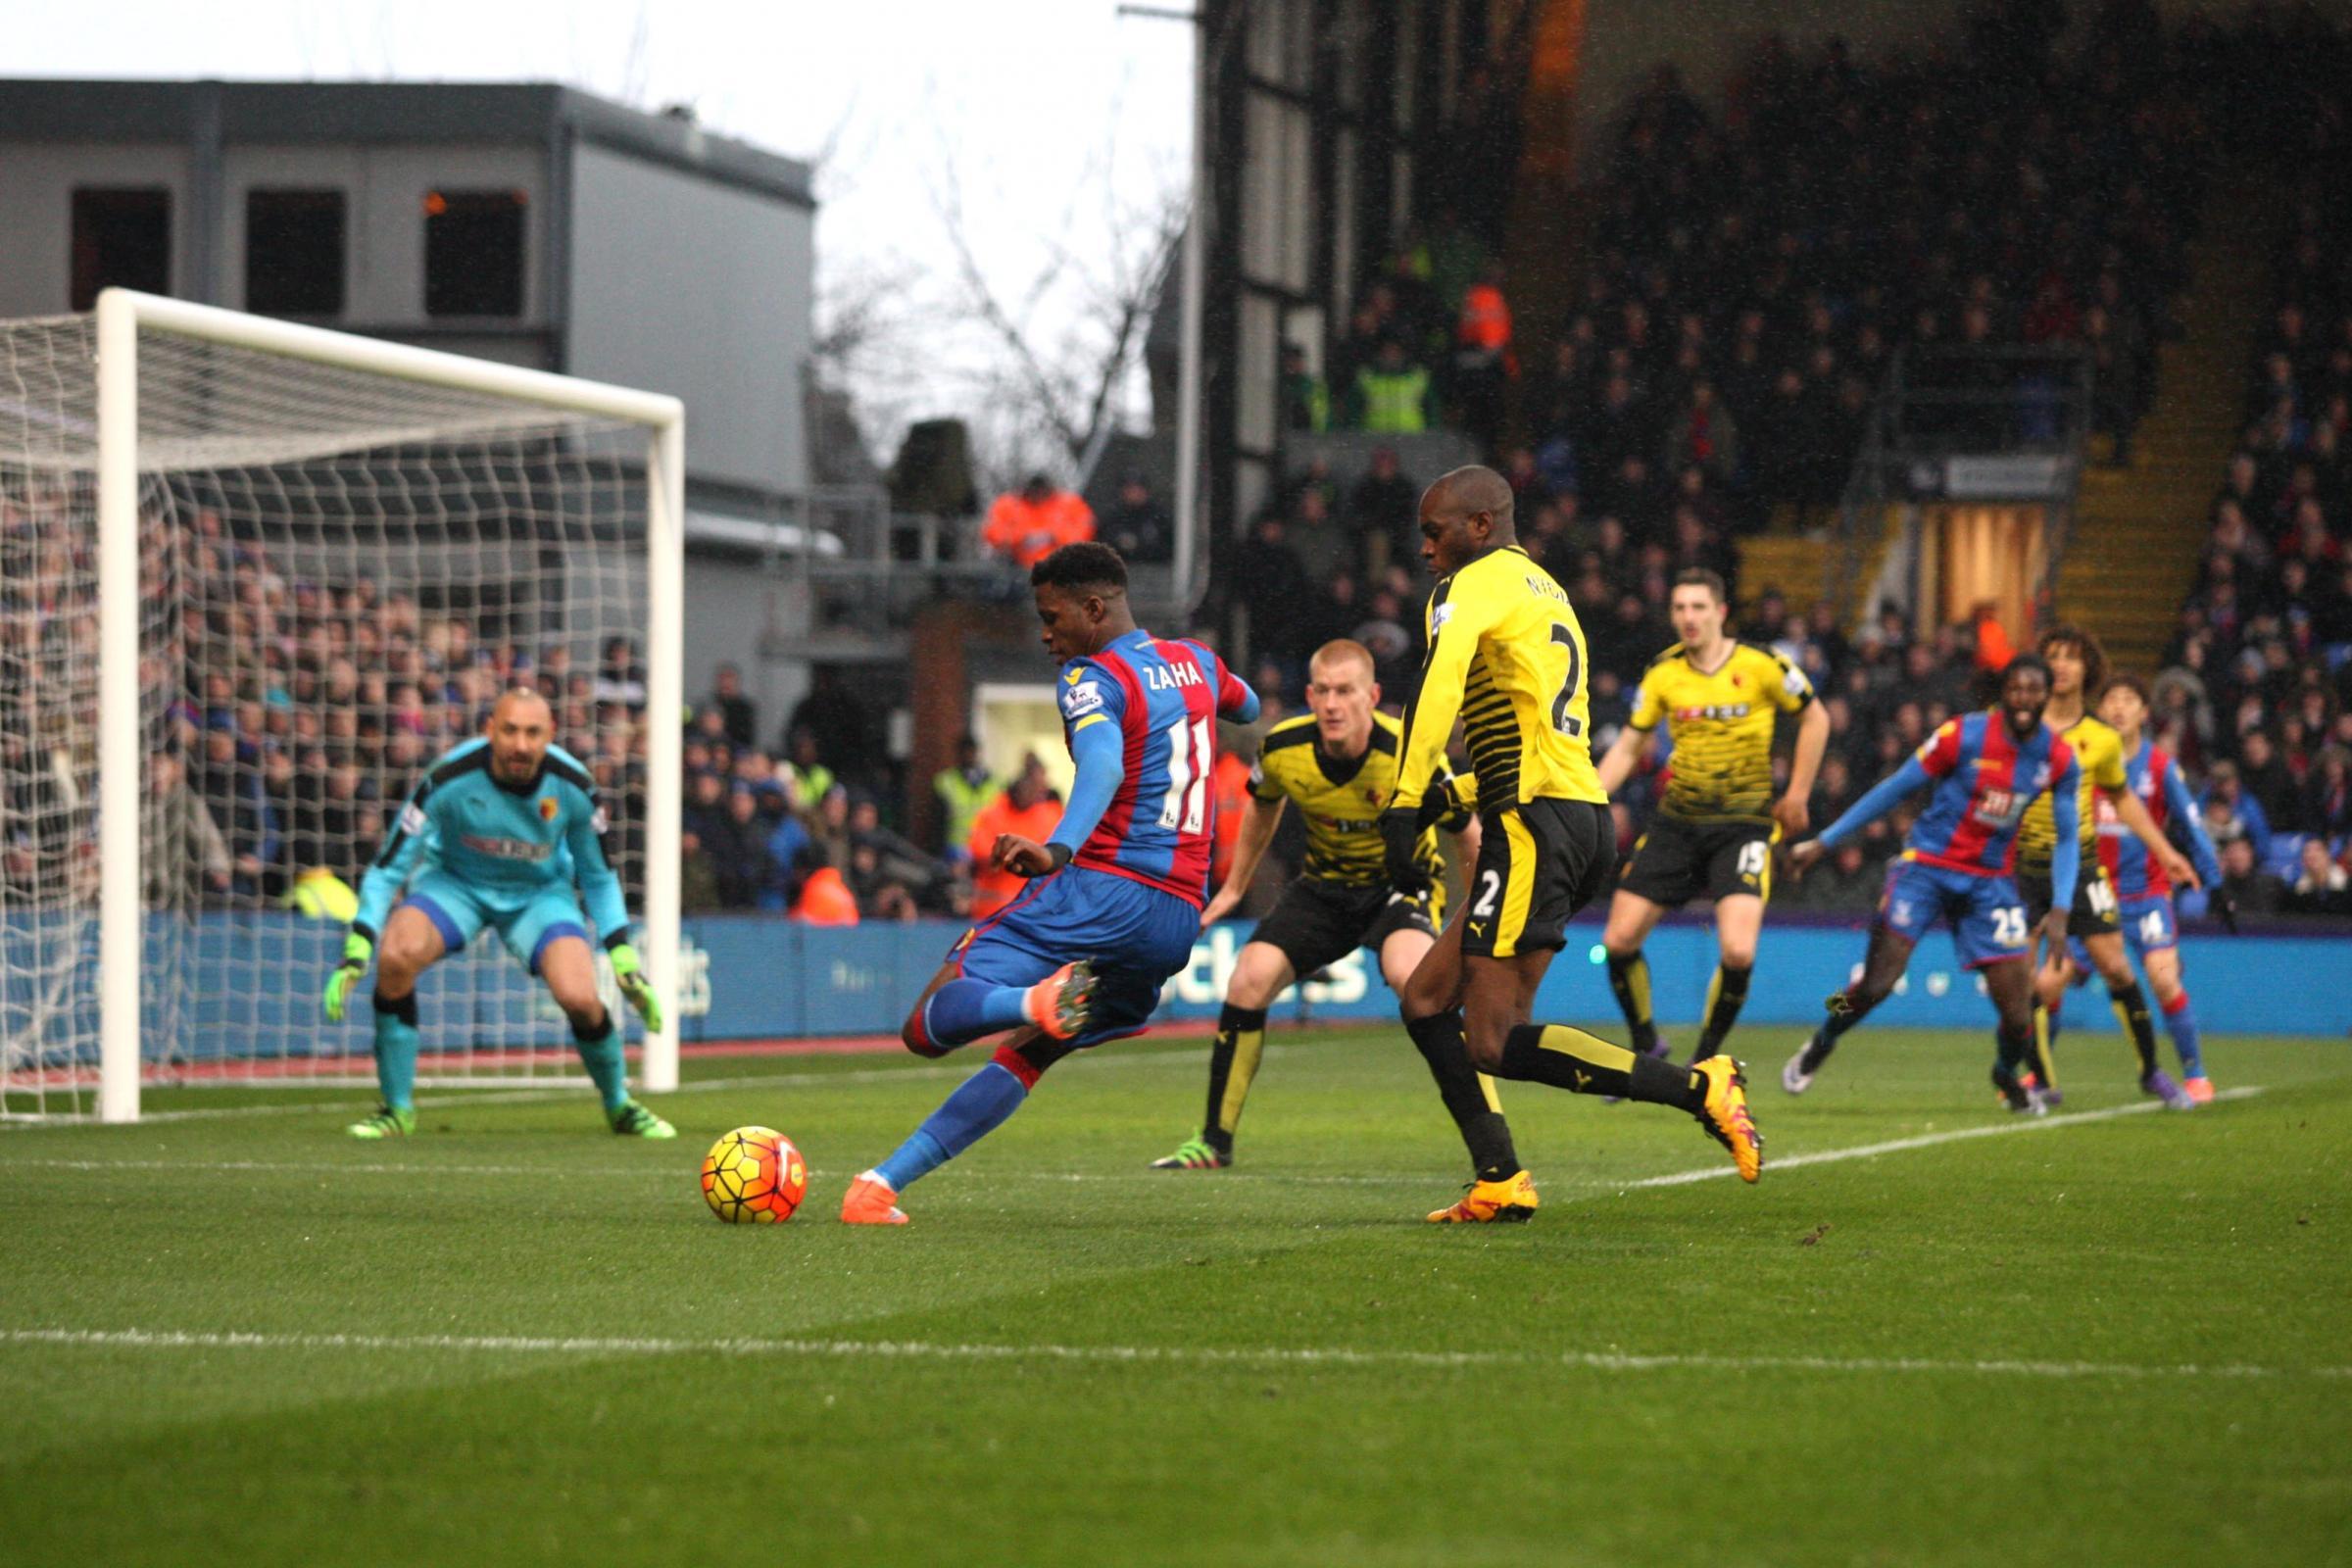 West Ham confirm date for final Boleyn Ground clash against Manchester United